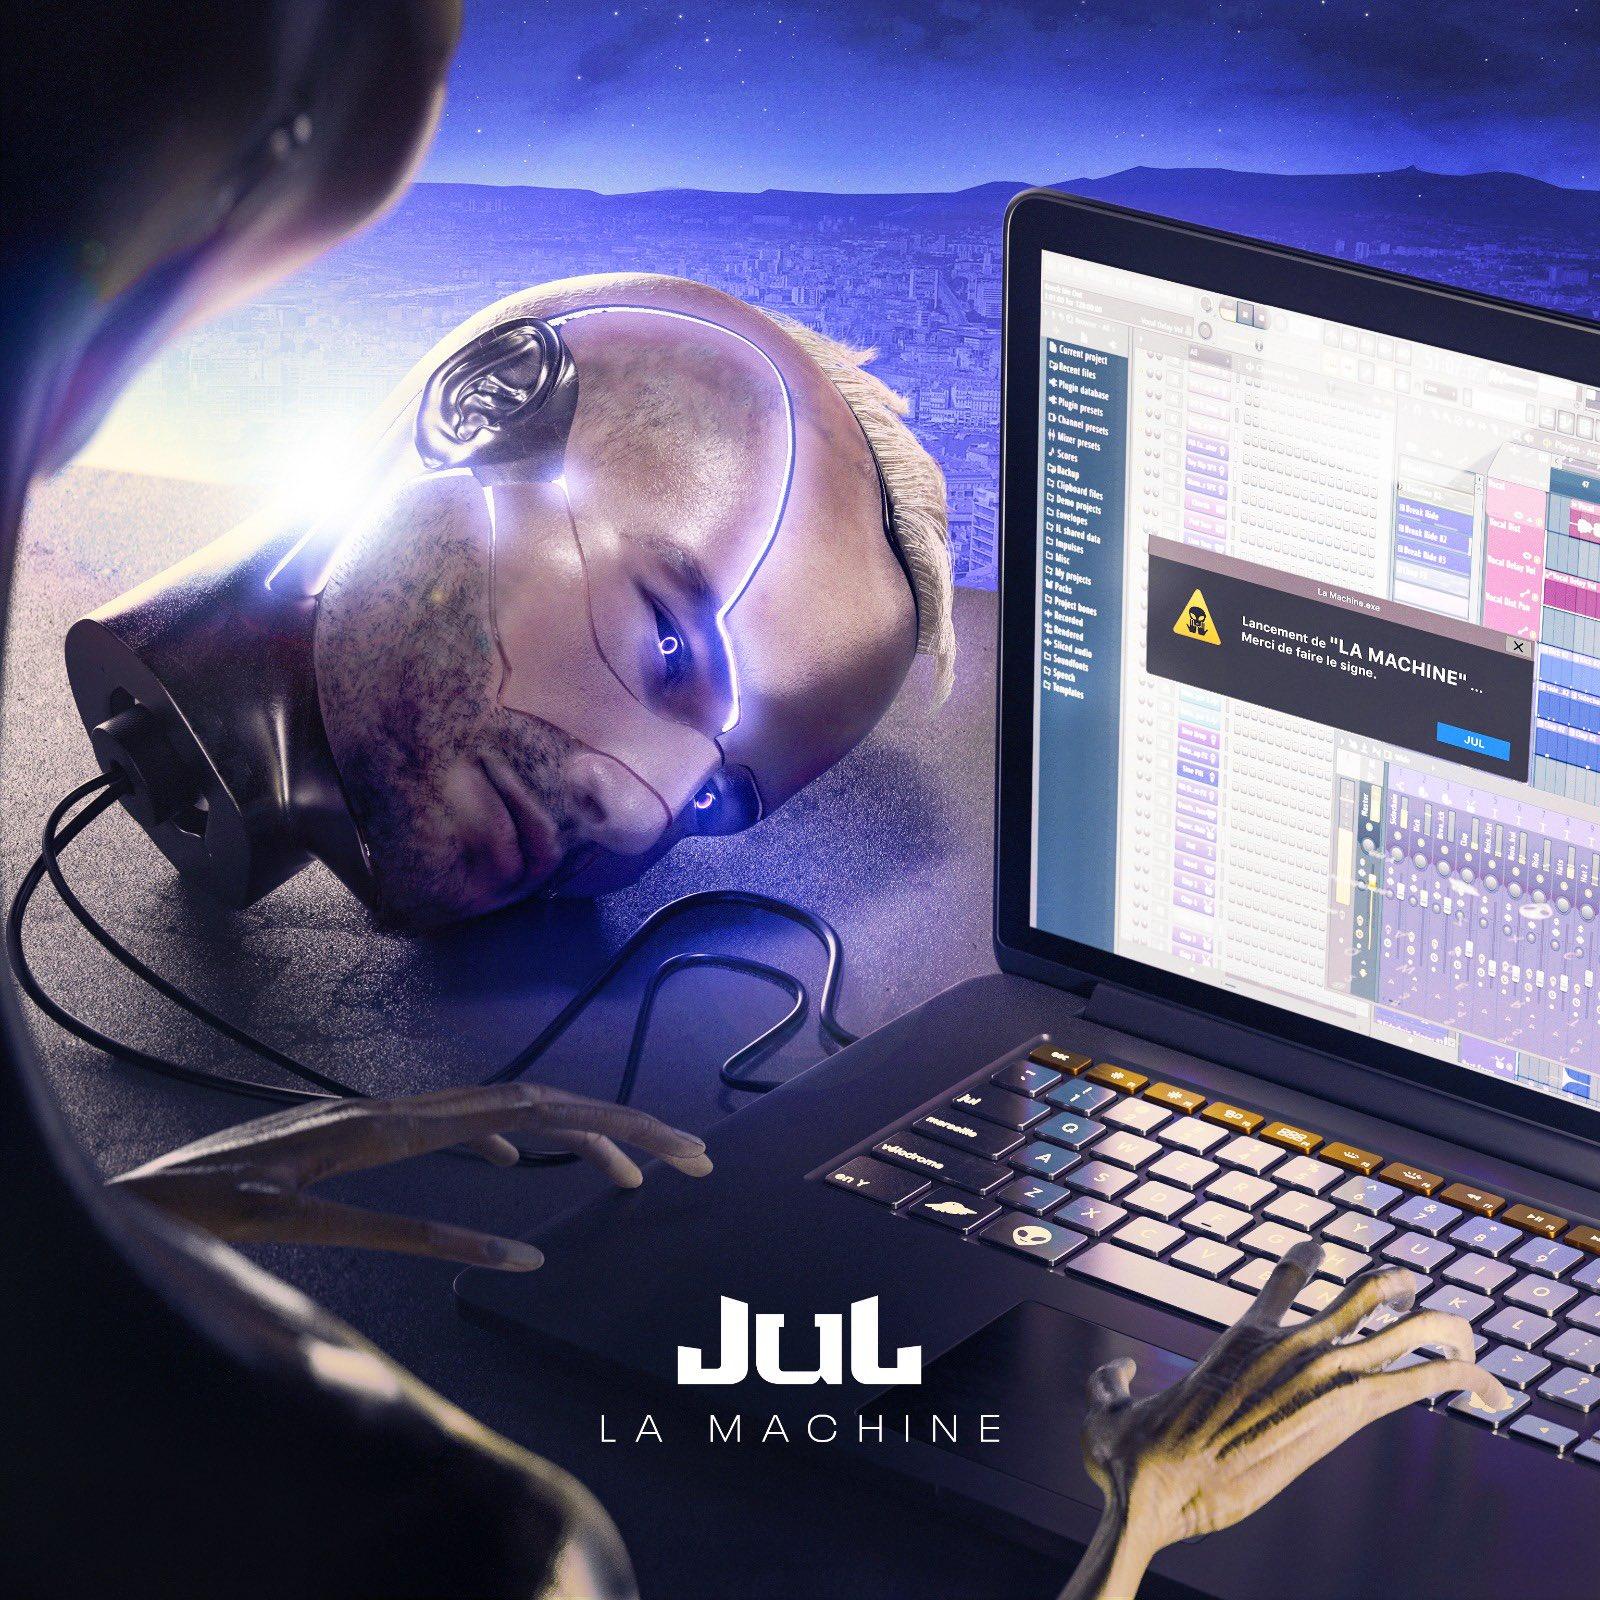 jul la machine artwork album